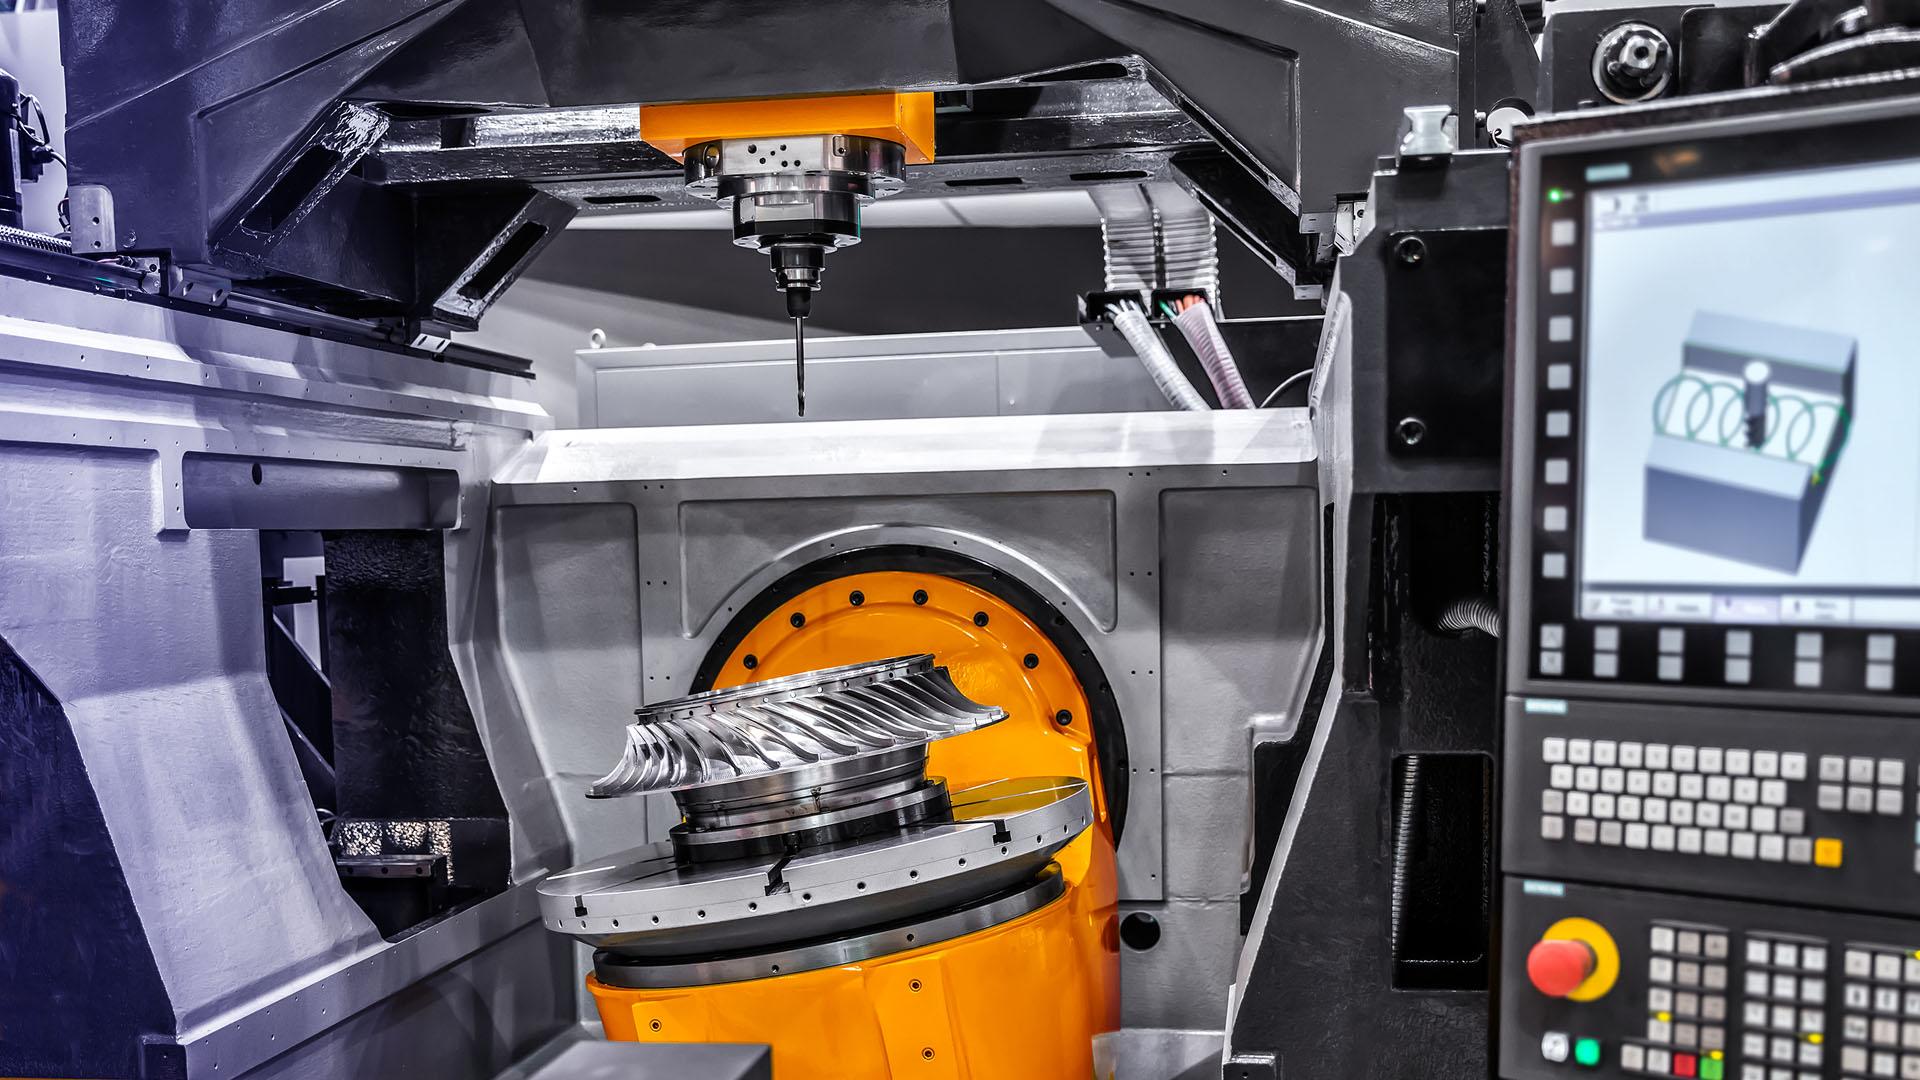 Automatic Engineers - CNC Machines